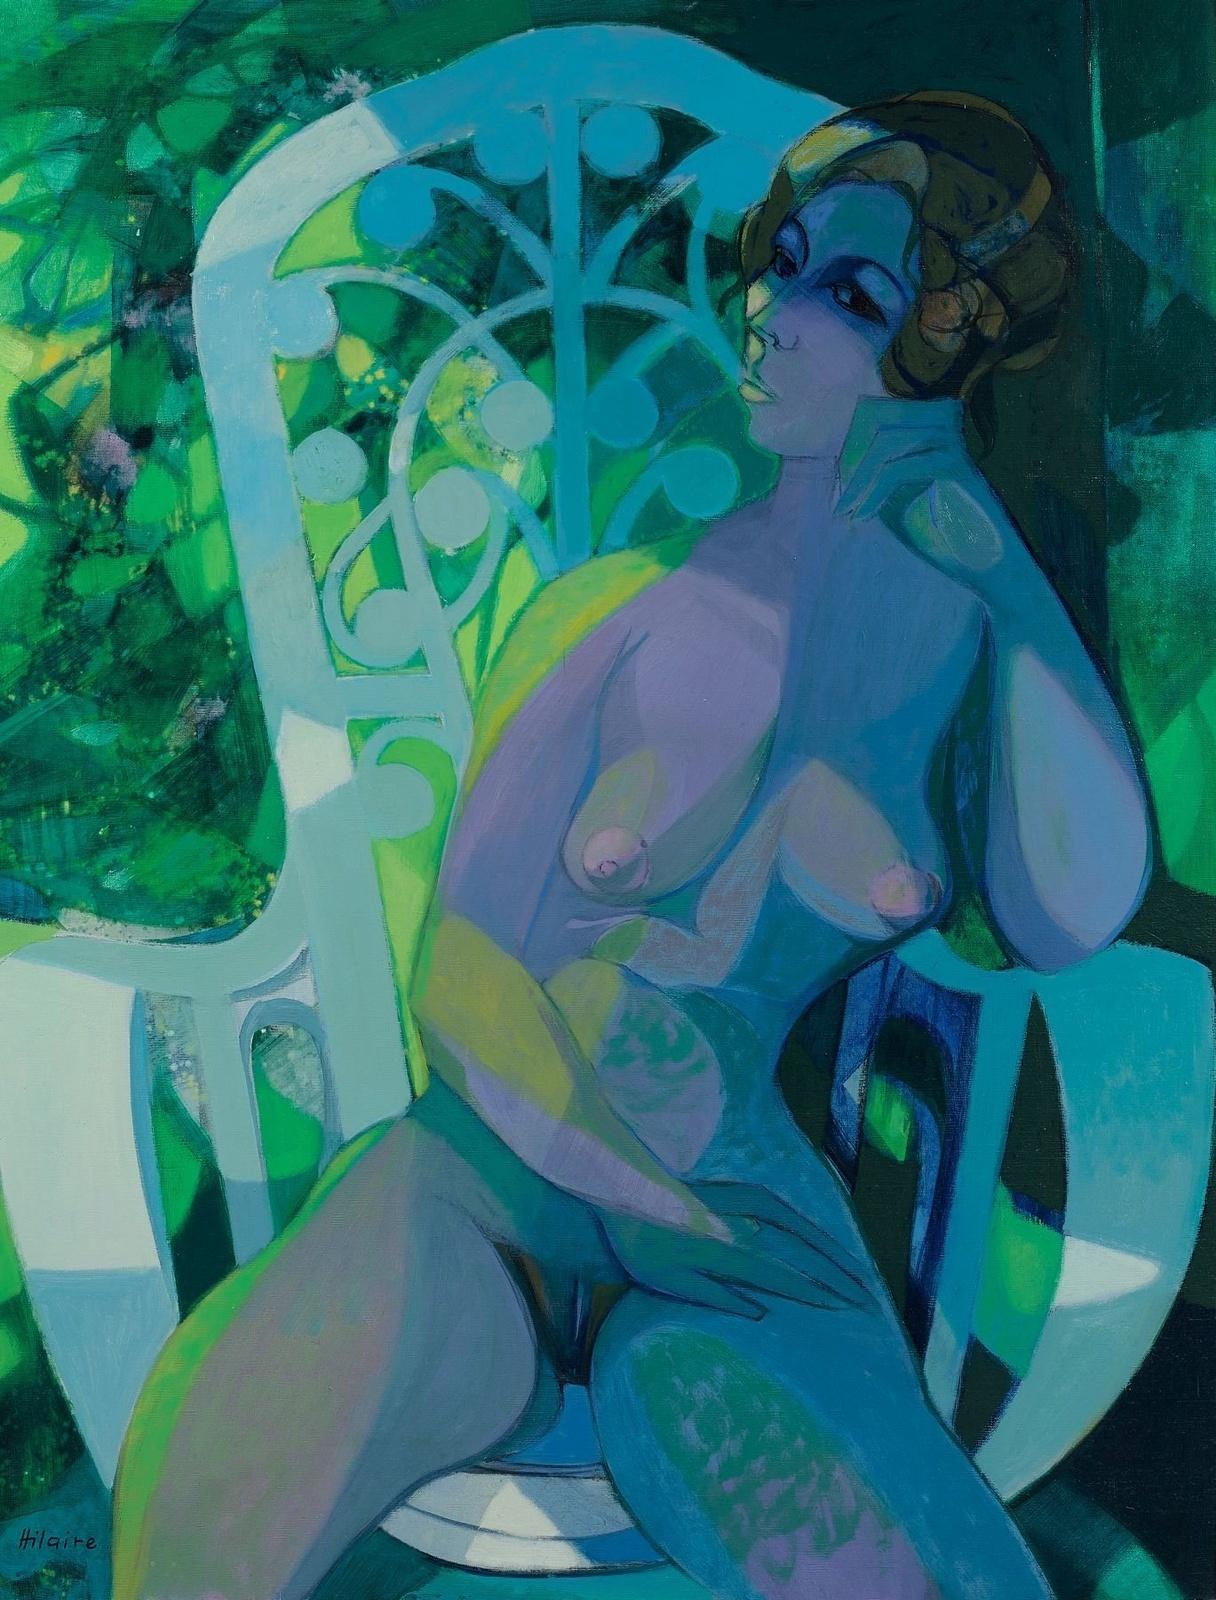 Камиль Илер. Обнаженная в саду (Naked In The Garden). 116 х 89 см. Частное собрание